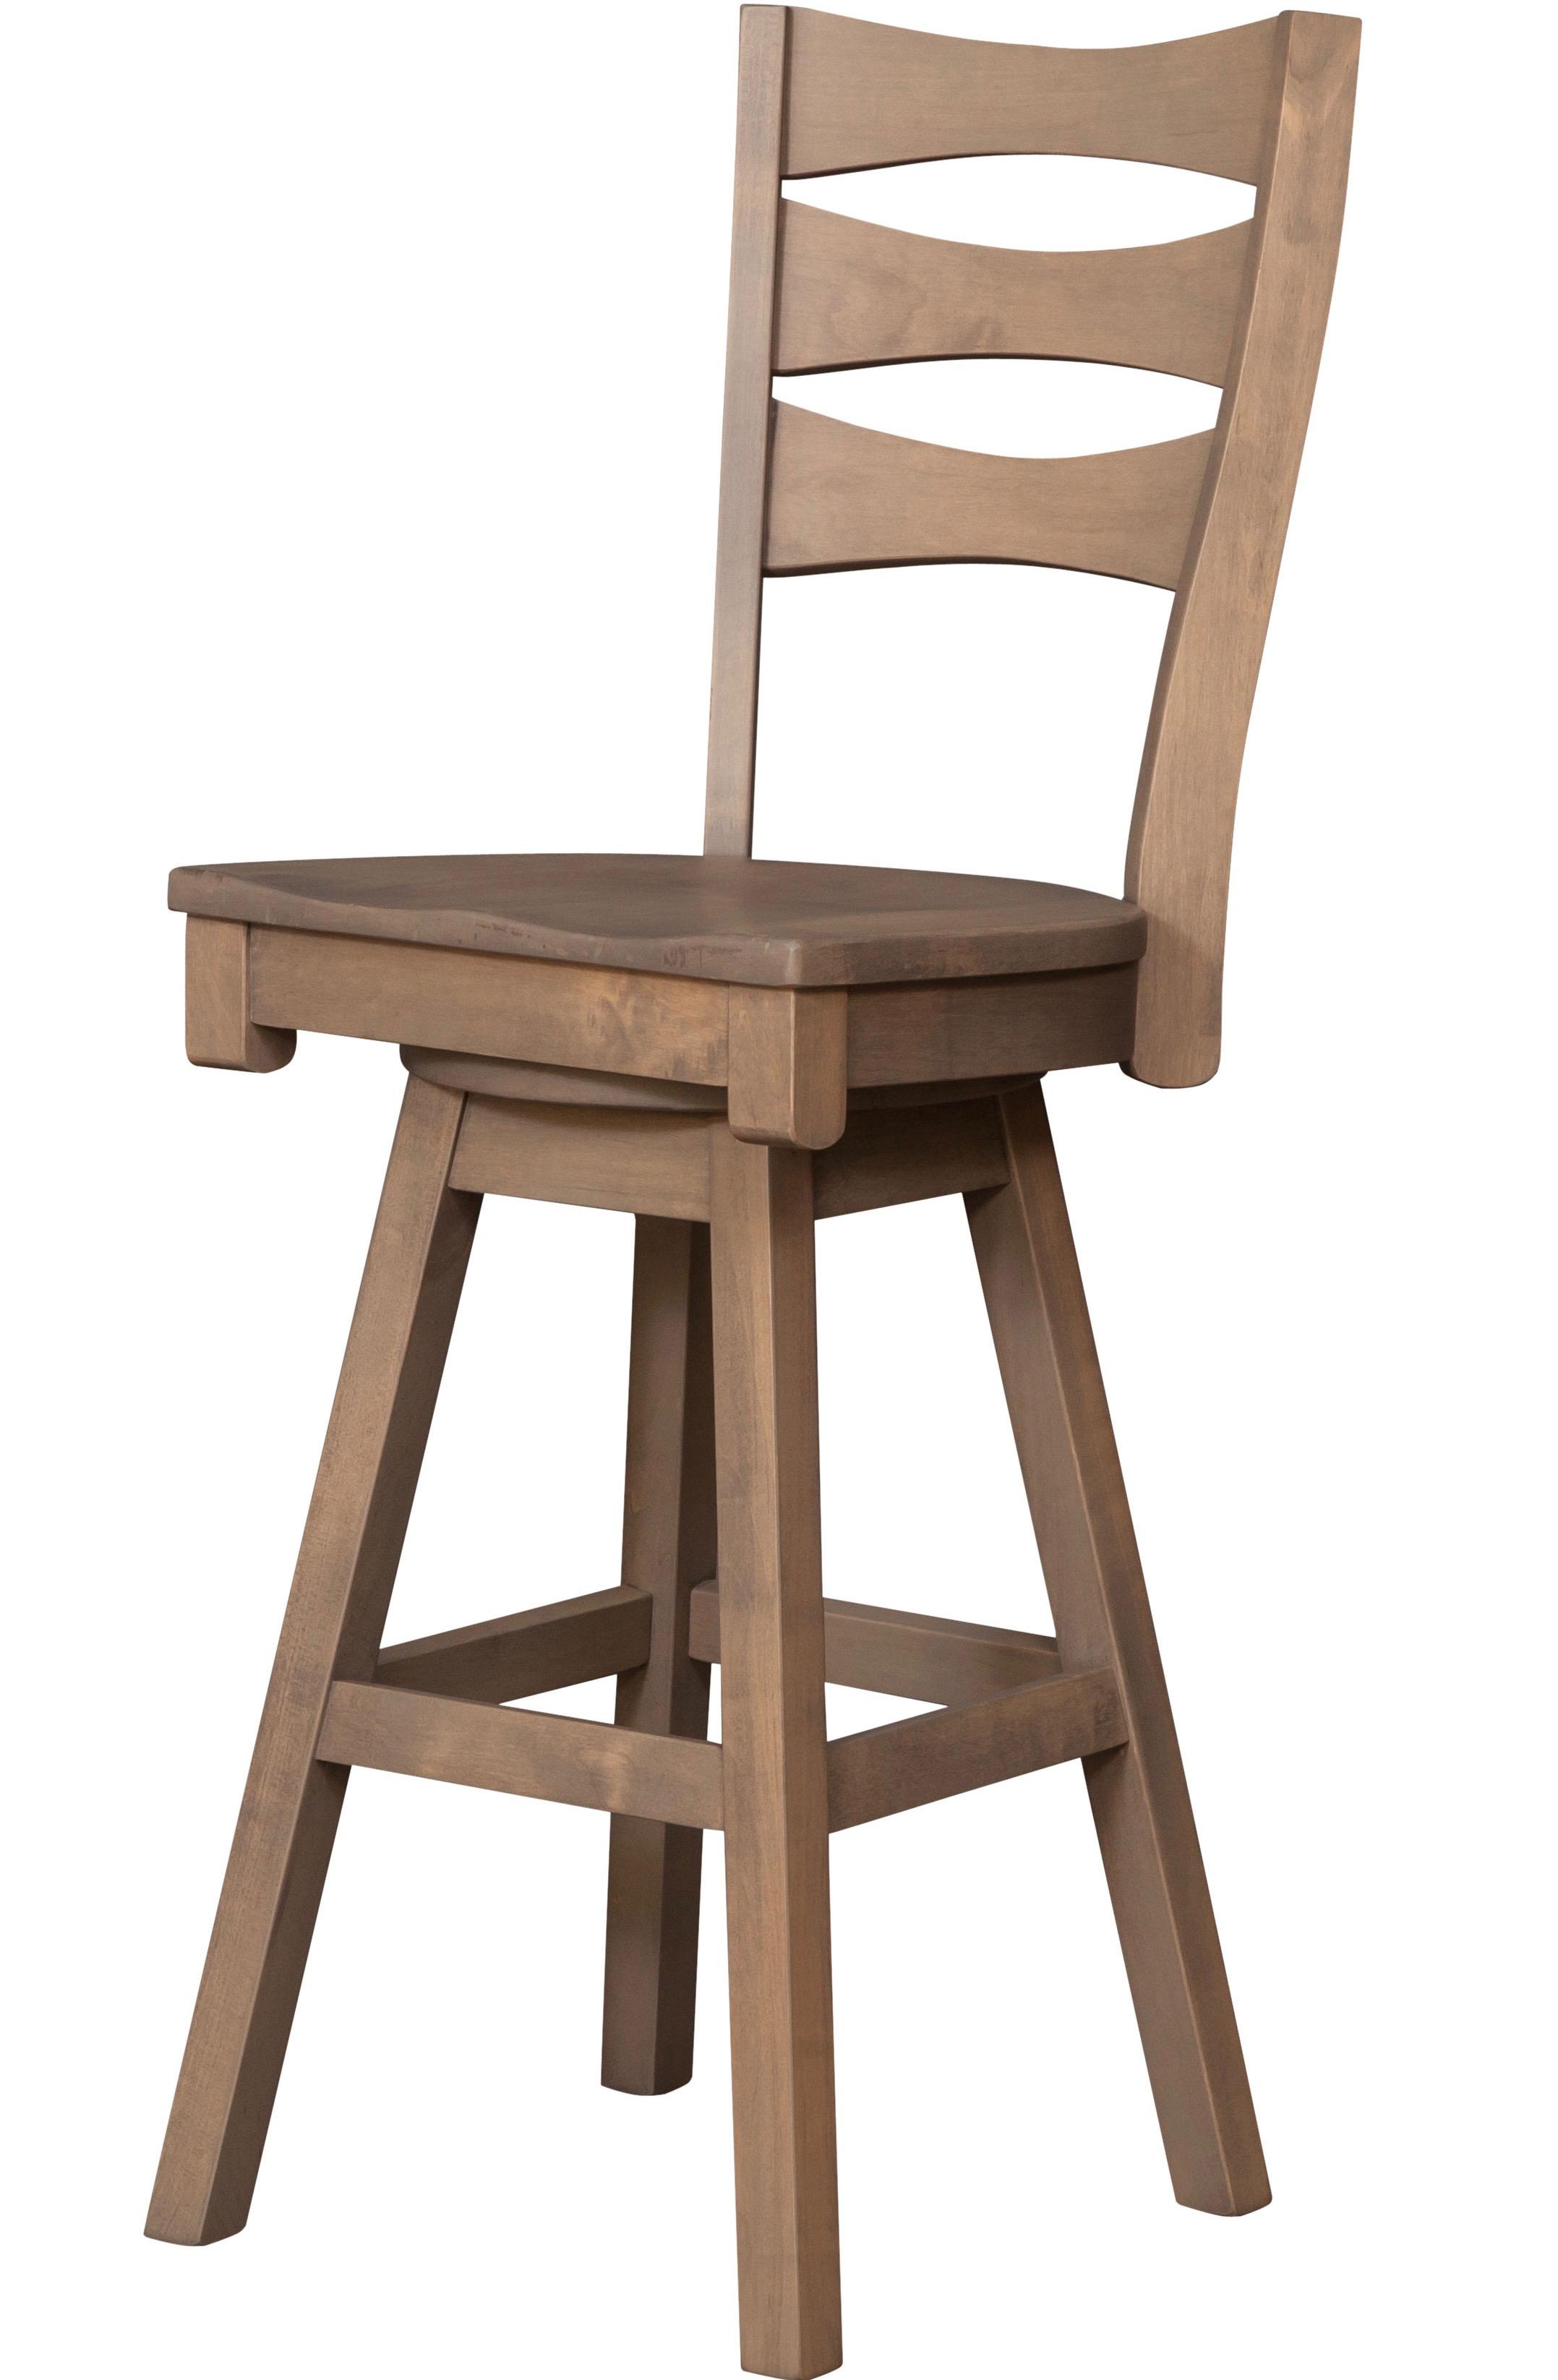 Sierra swivel bar chair this oak house handcrafted